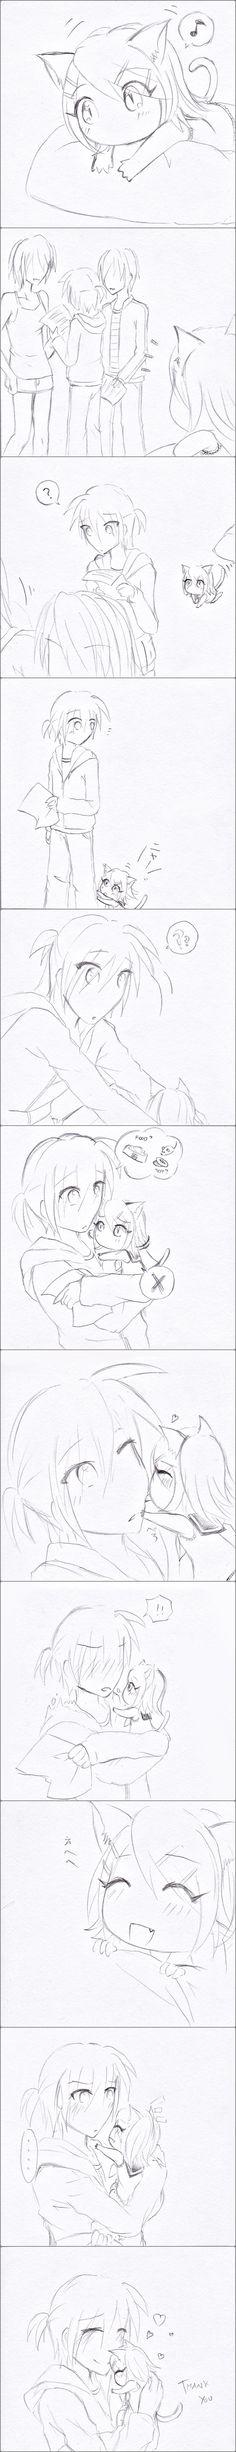 ::_i-just-want-you-keep-smiling_:: by Zatsune-sama on DeviantArt